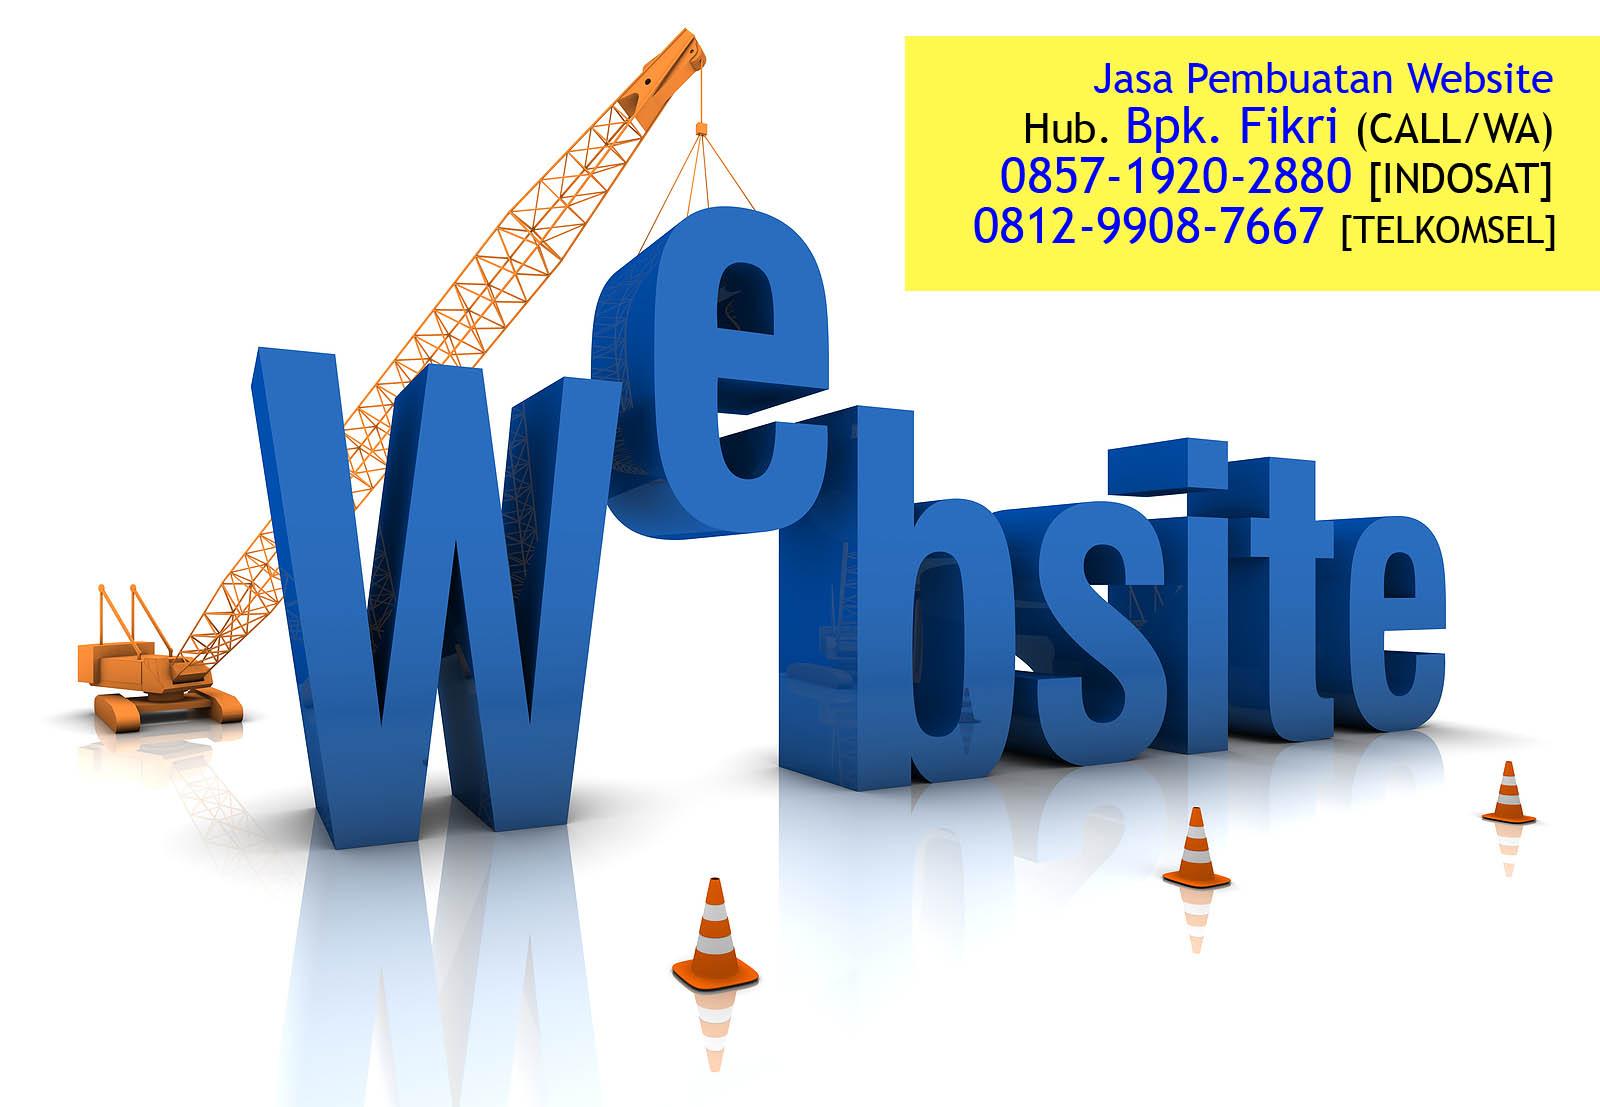 Jasa Pembuatan Website Murah di Bekasi